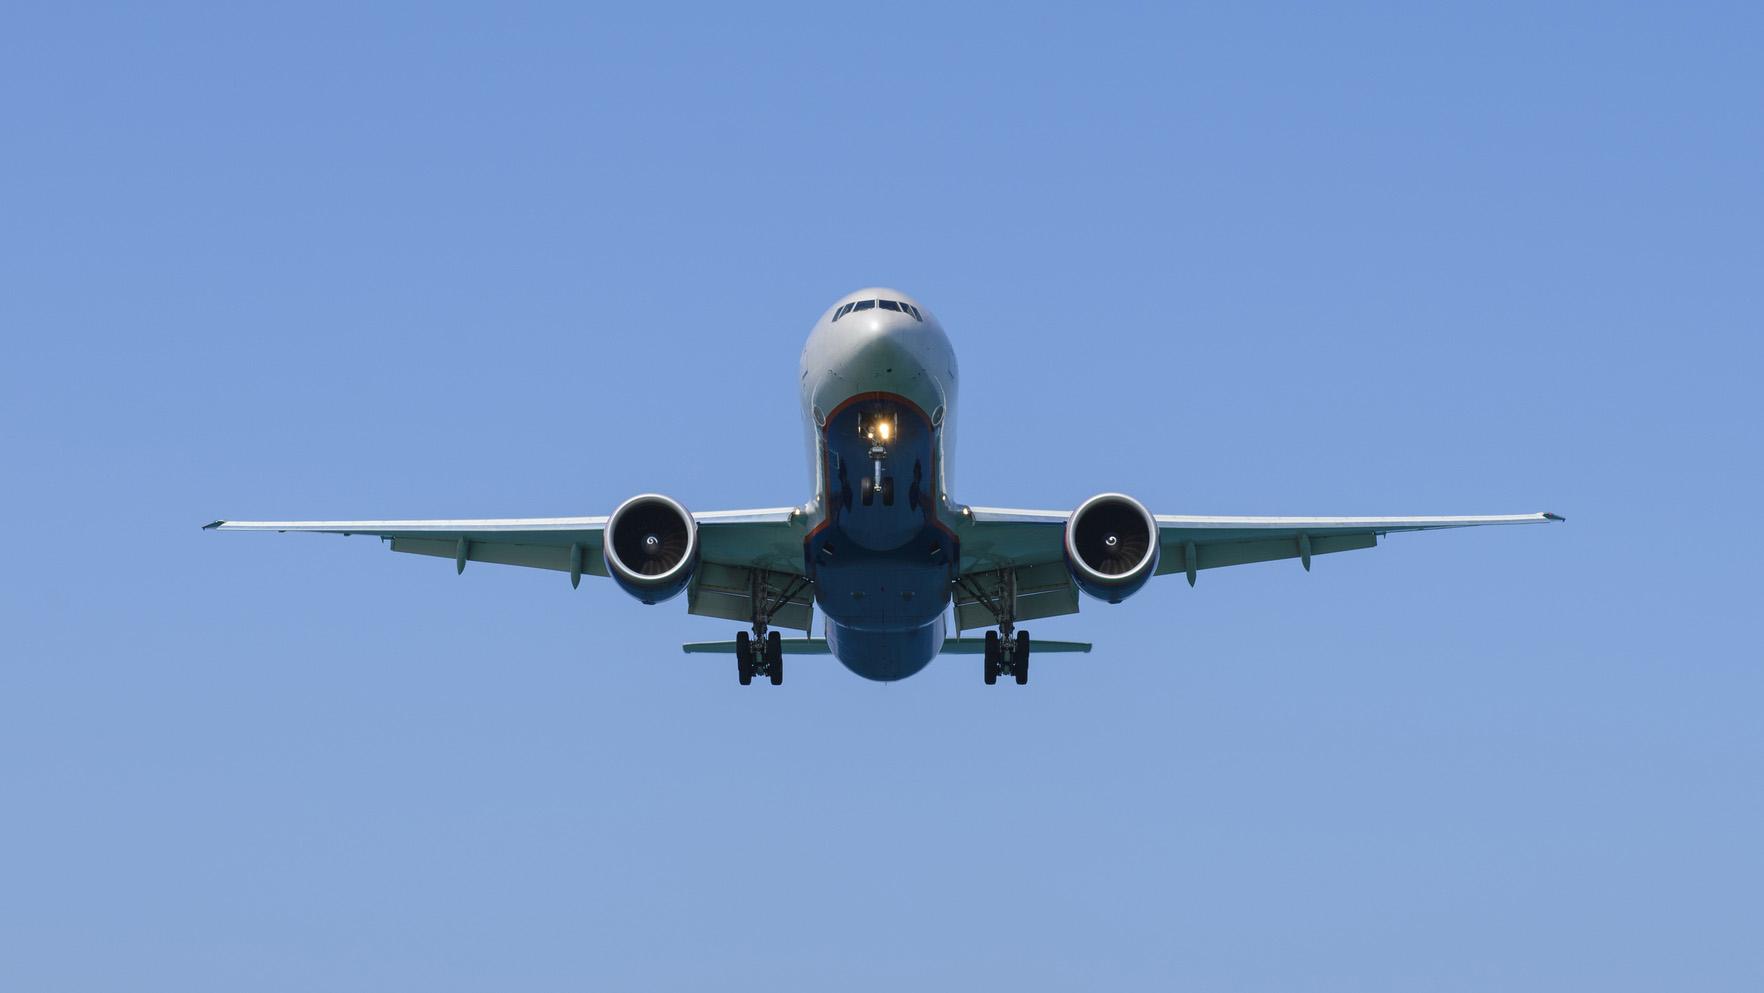 Air Travel Needs Independent Regulators